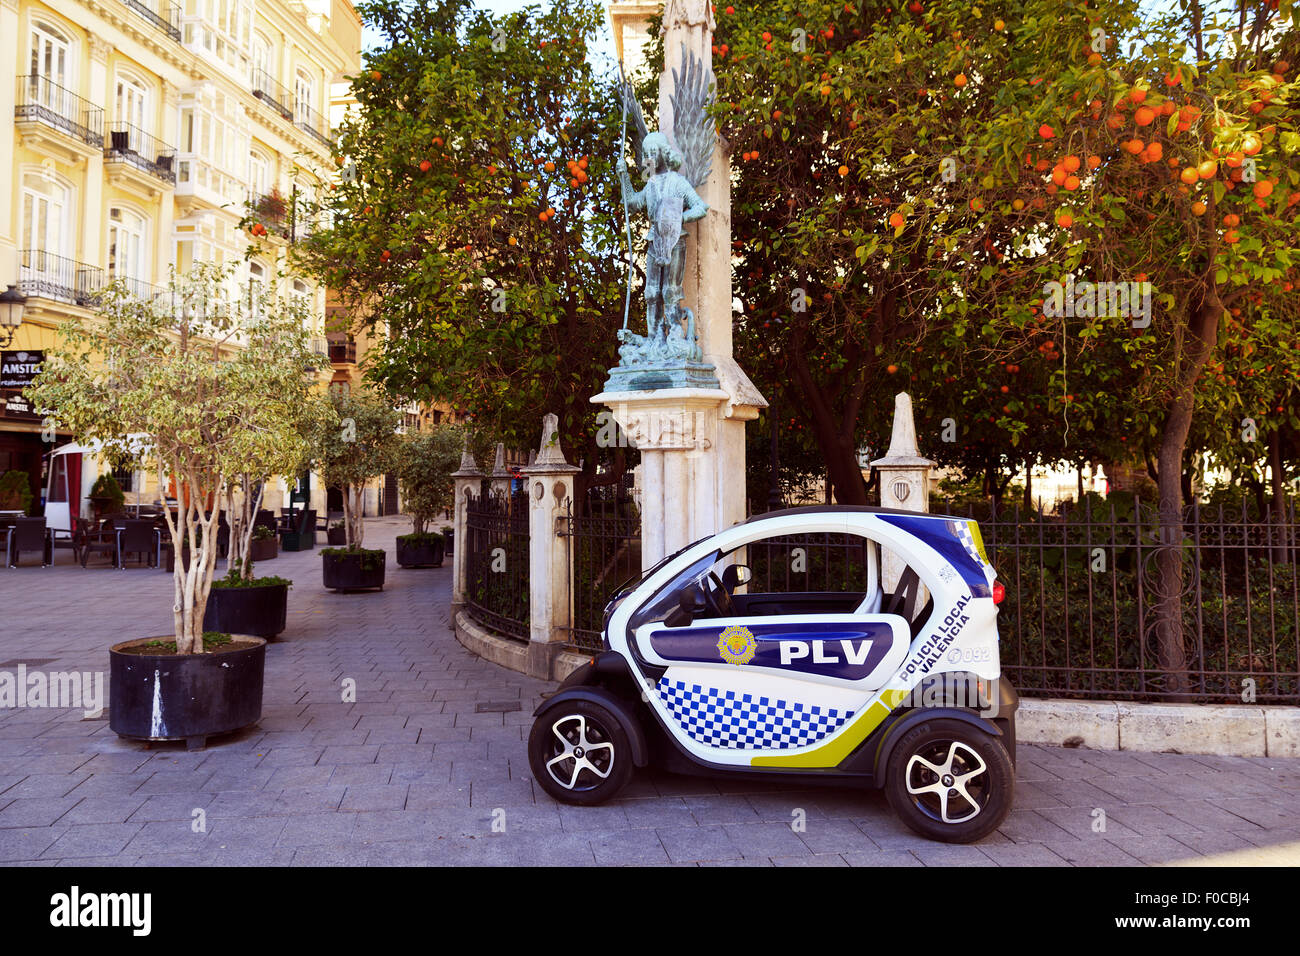 Electric Spanish Police Car Valencia Style Stock Photo Royalty